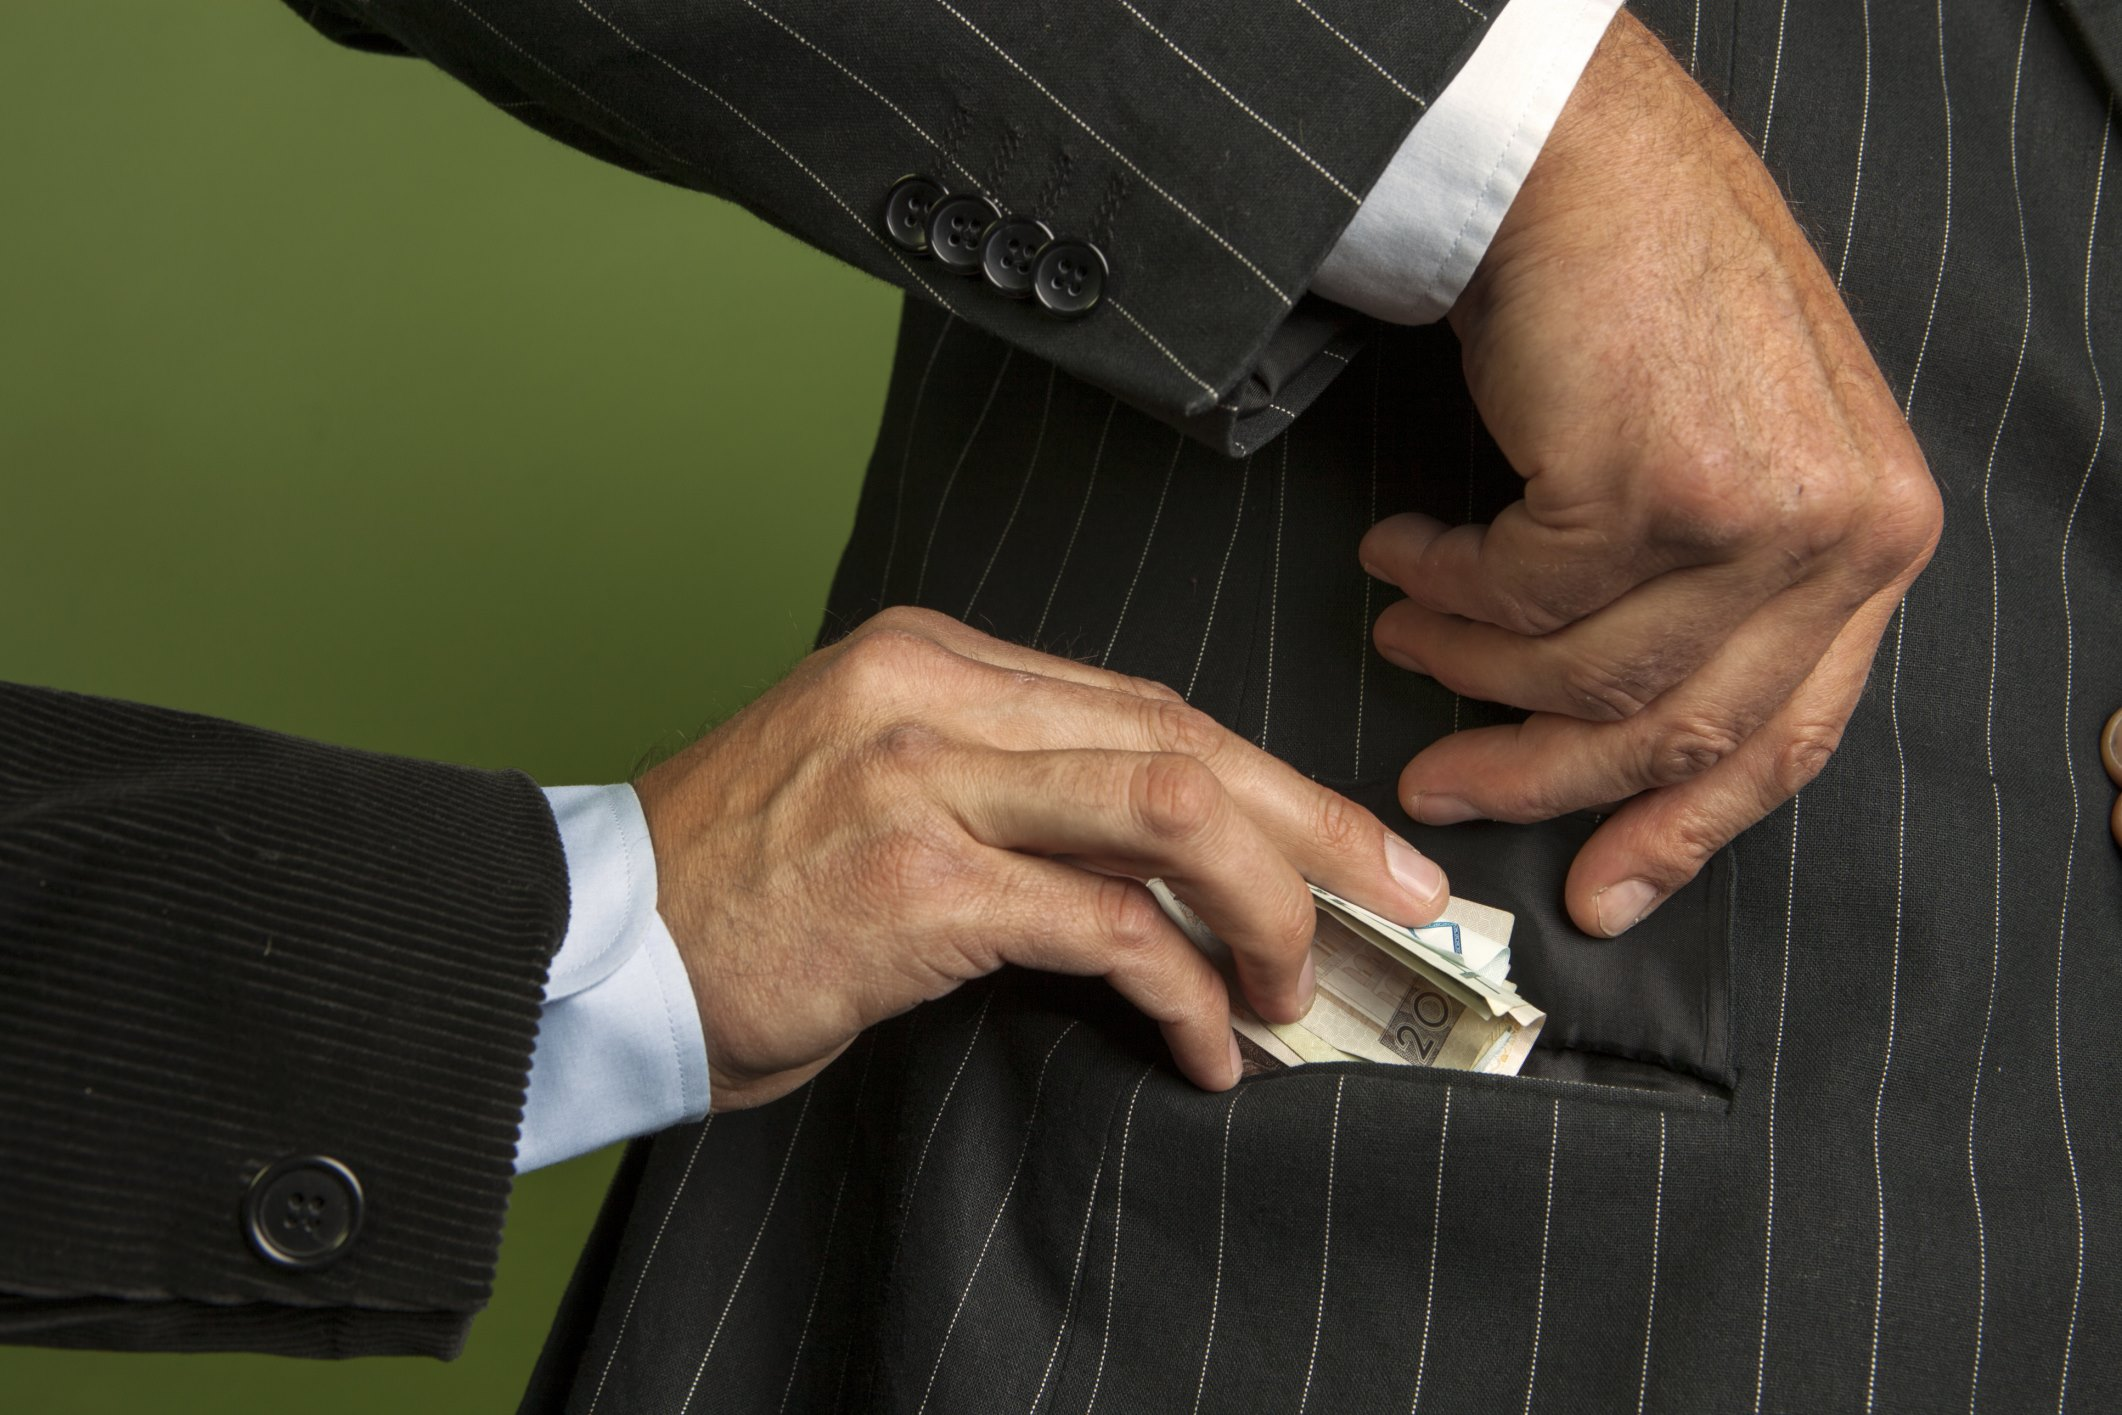 bribery4